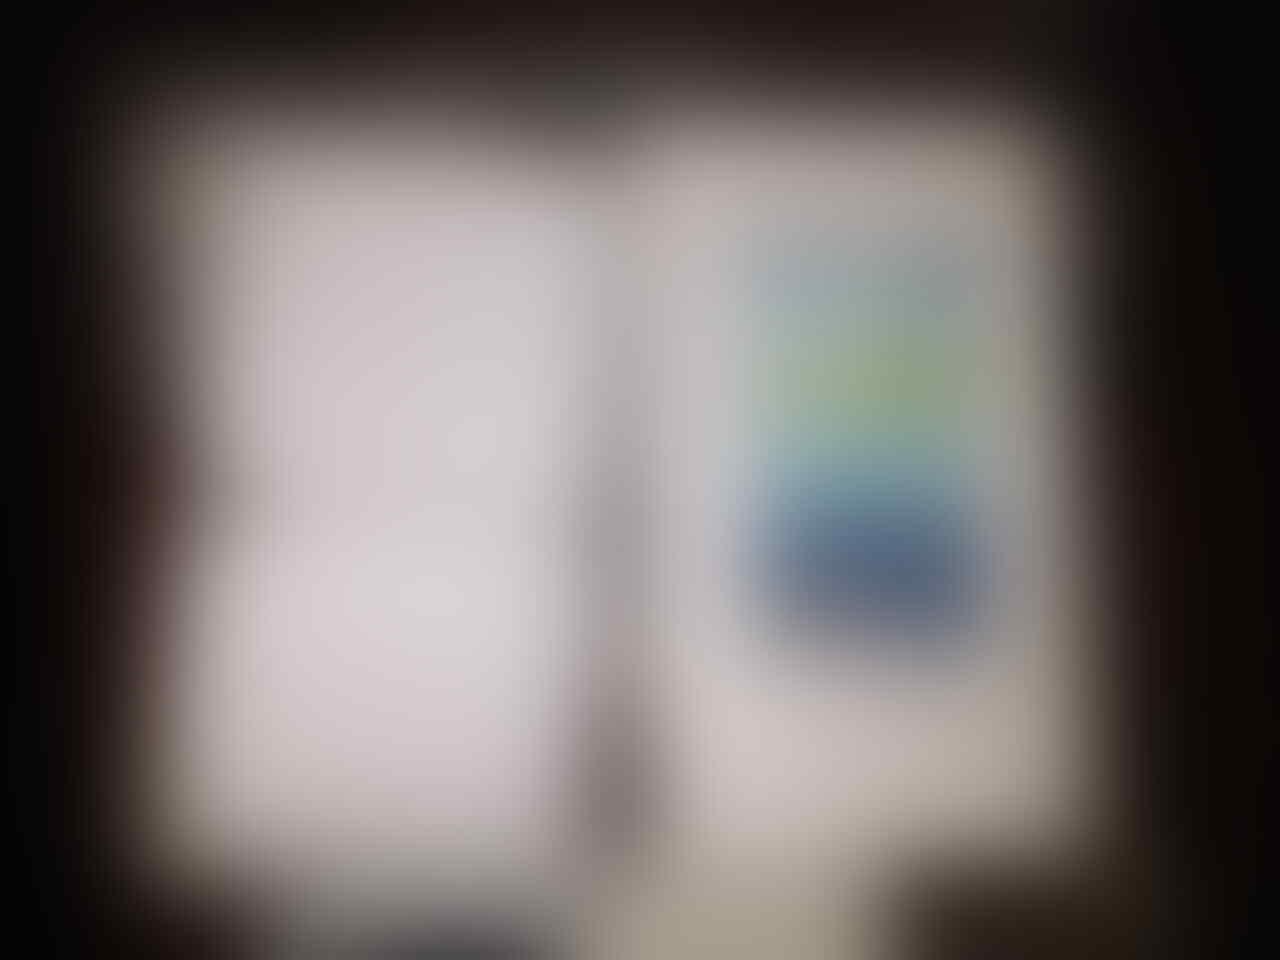 WTS > SAMSUNG GALAXY S3 [ BM ] UPDATED